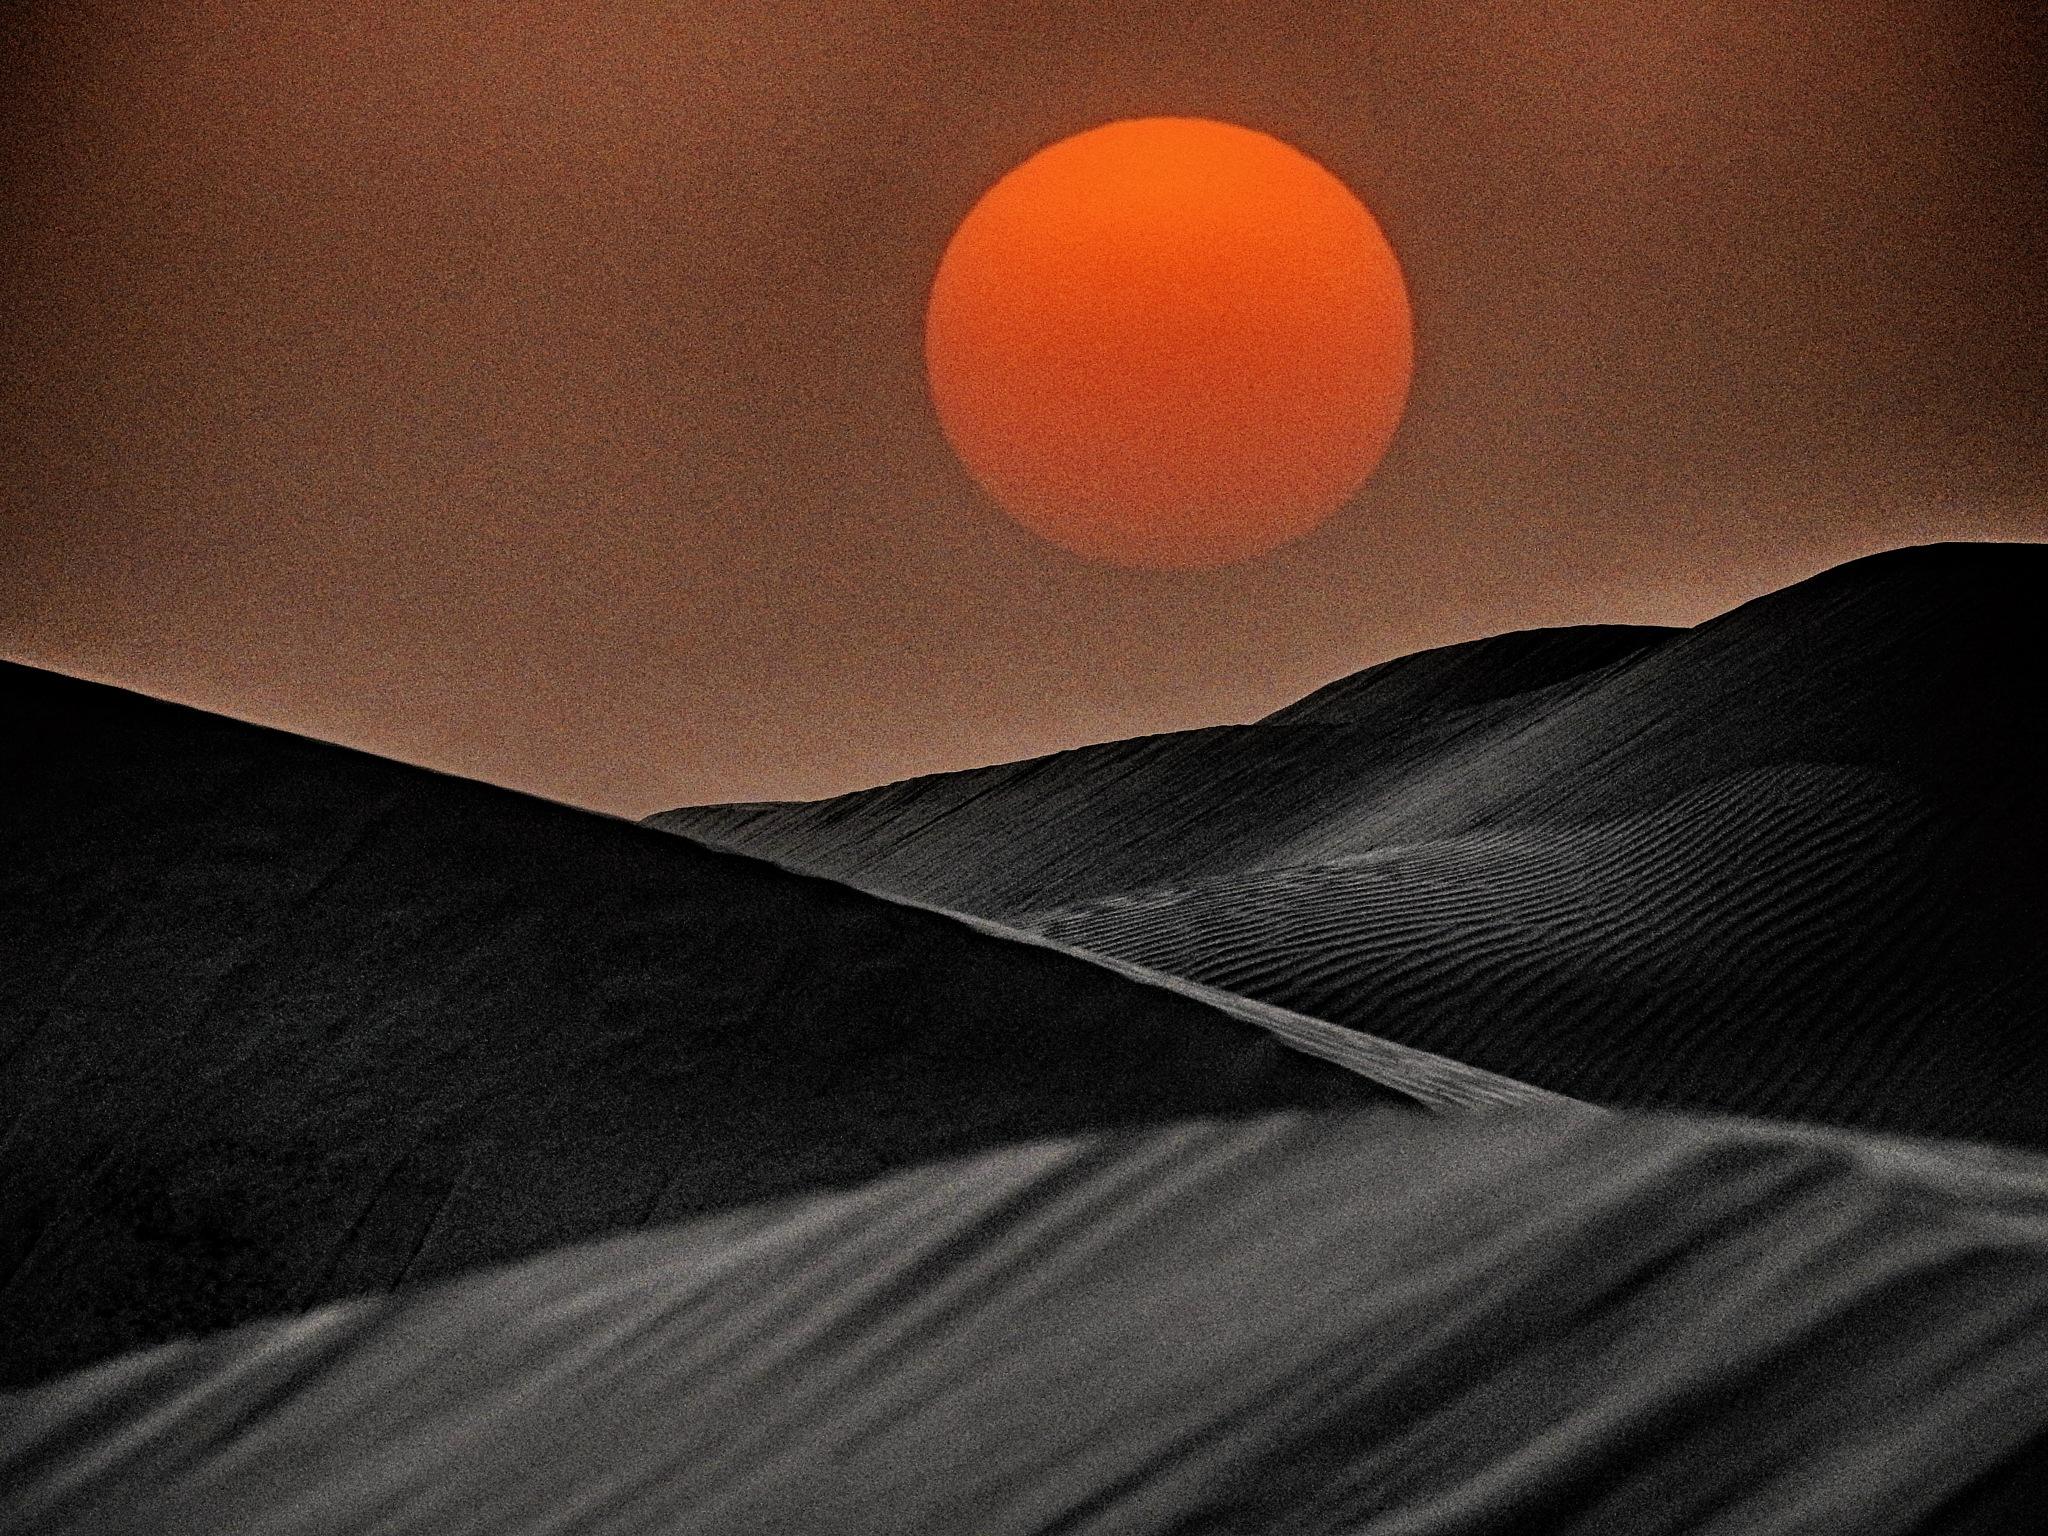 Sunset is still my favourite colour by Hisham Badran